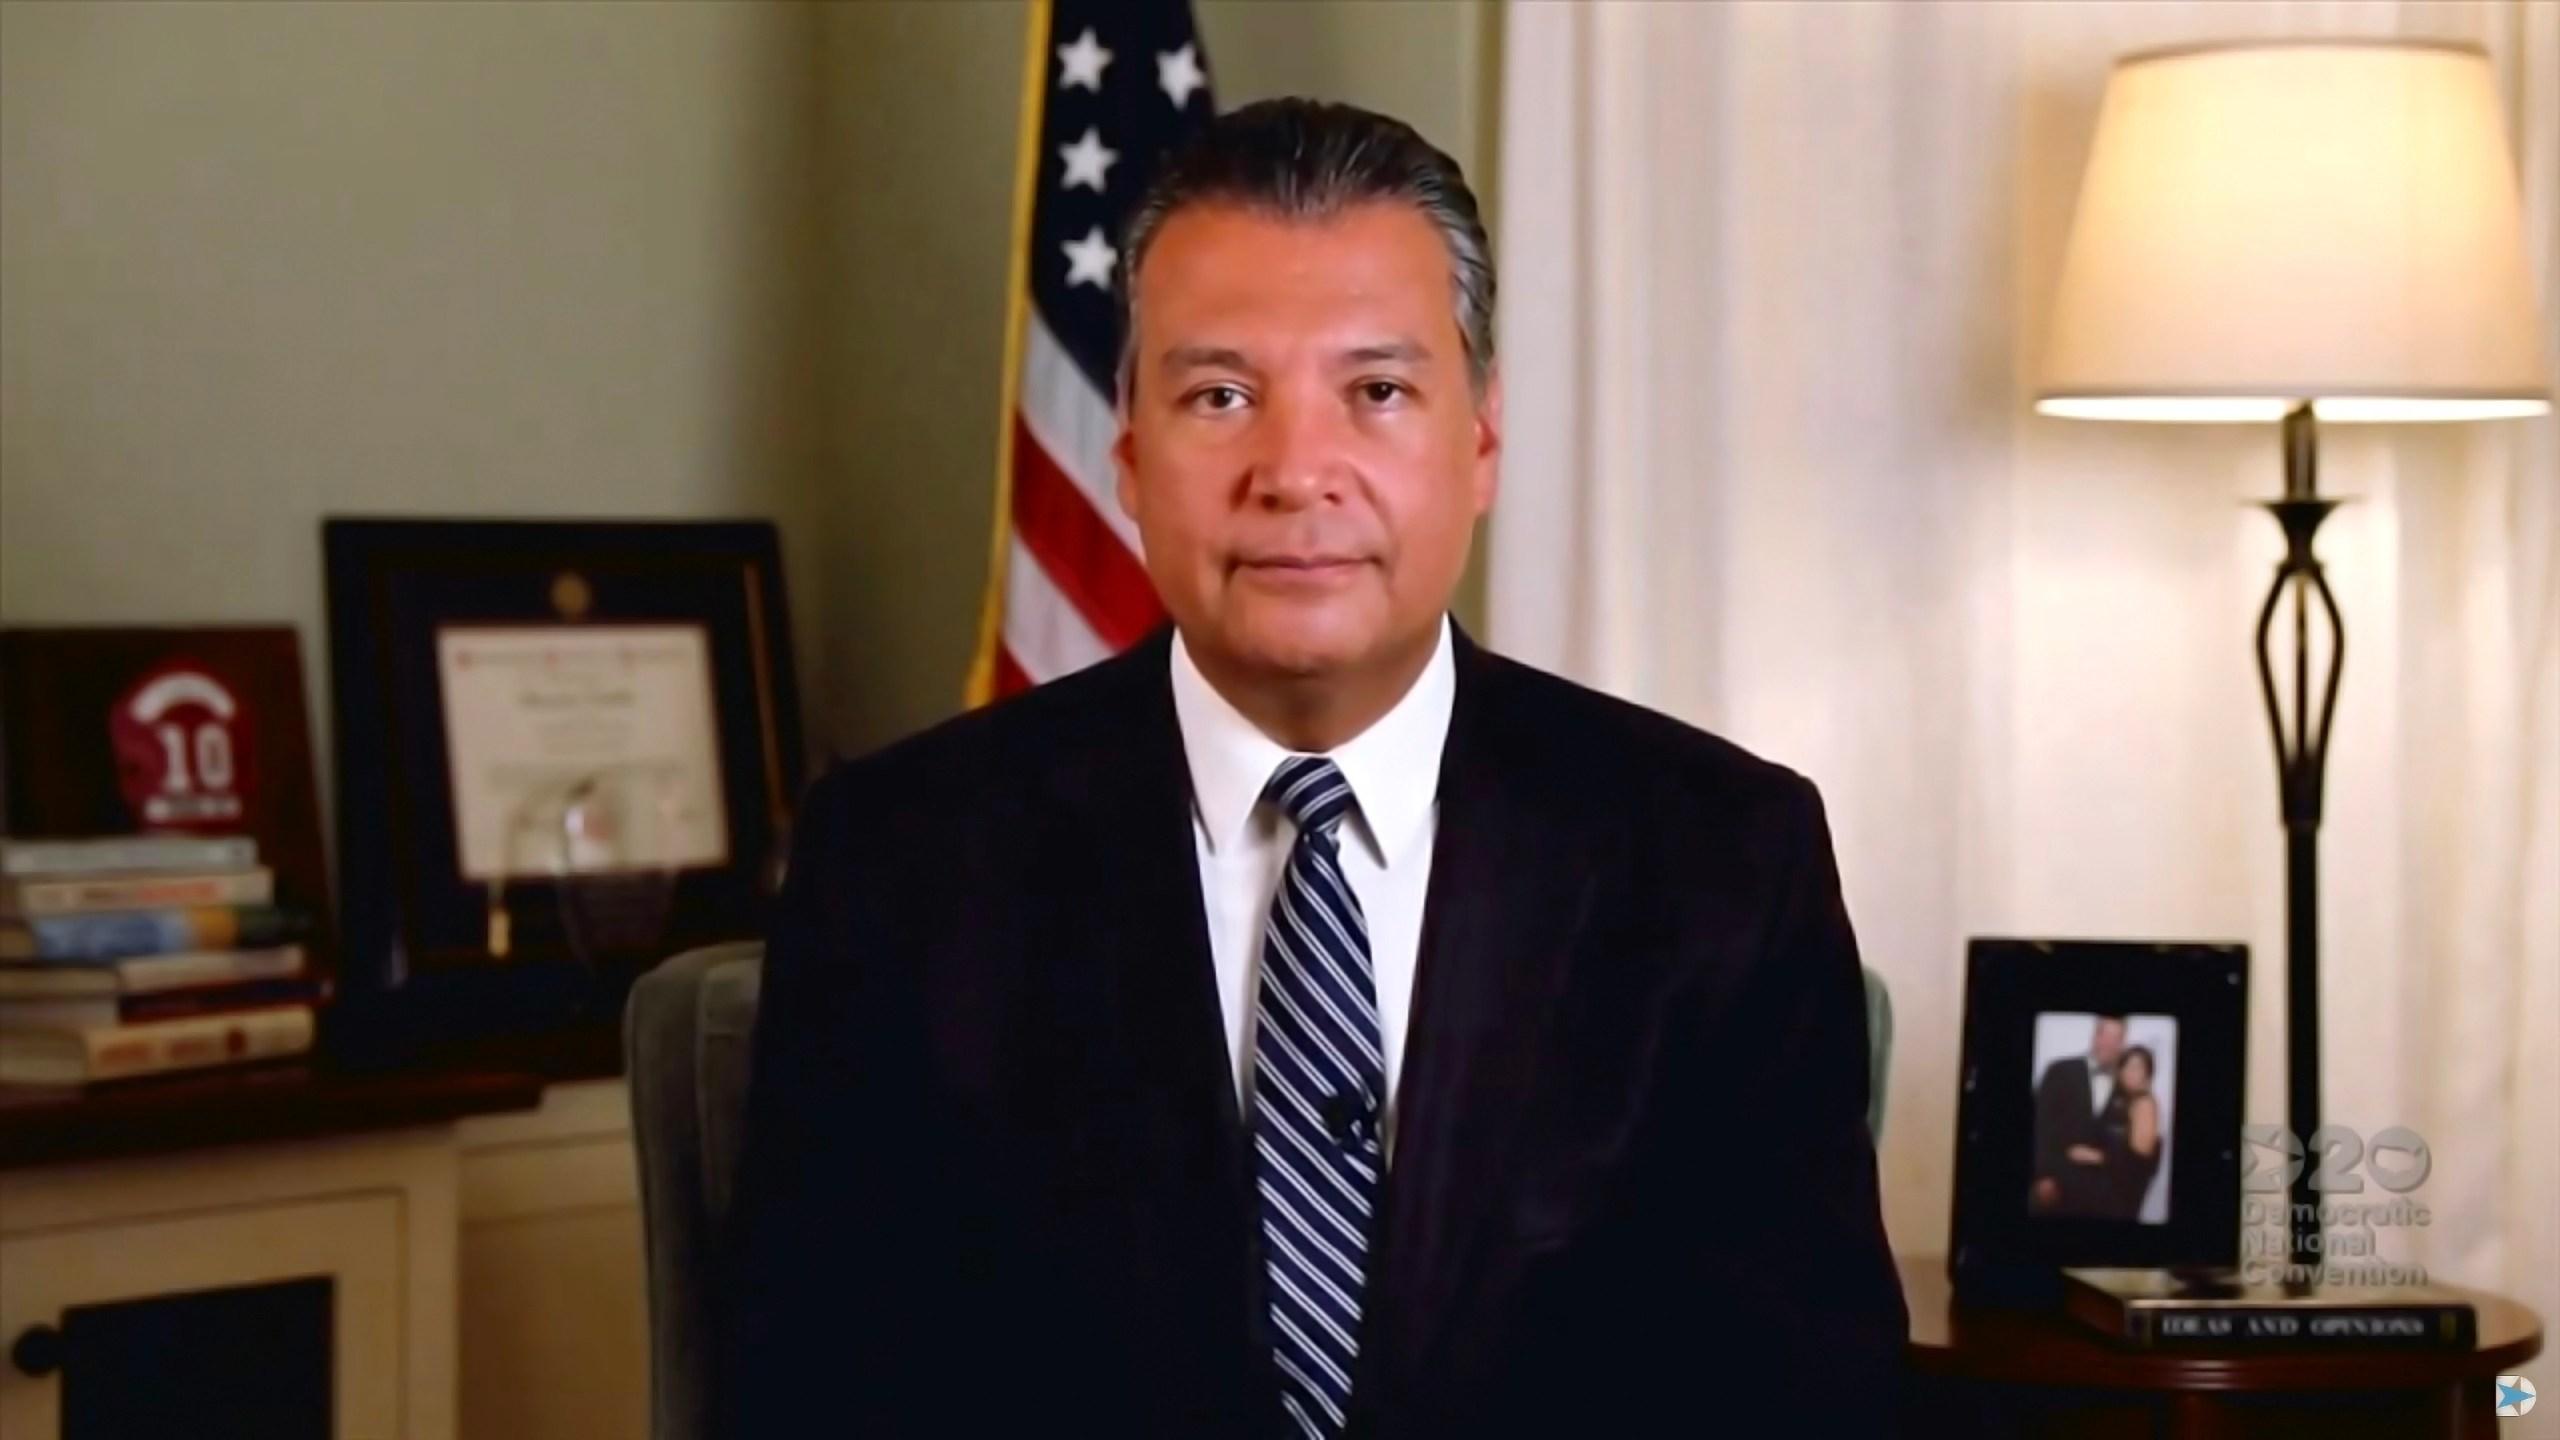 California Secretary of State Alex Padilla addresses the virtual convention on Aug. 20, 2020. (DNC via Getty Images)